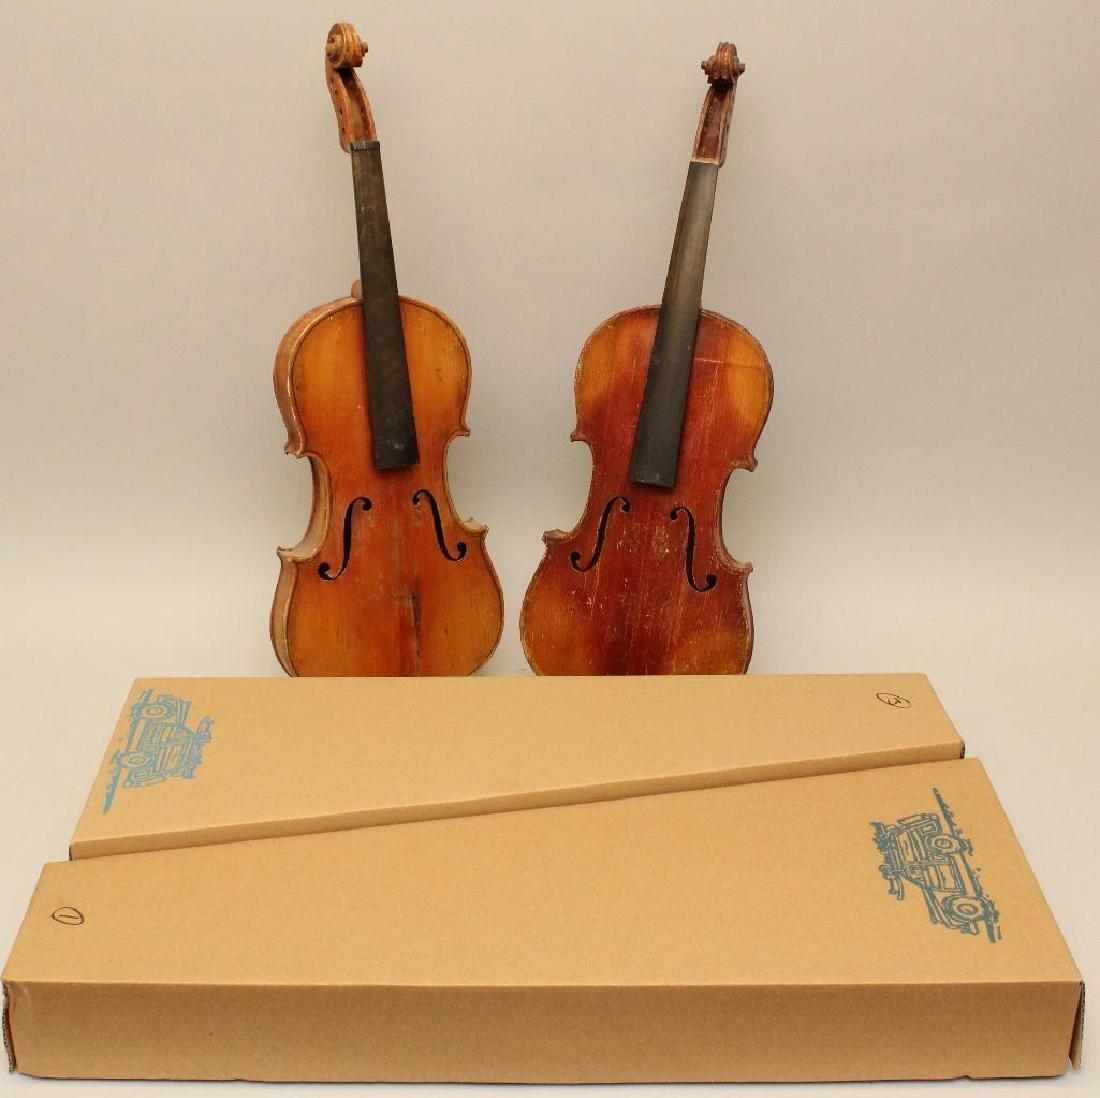 Pair of Unlabled Violins - 8